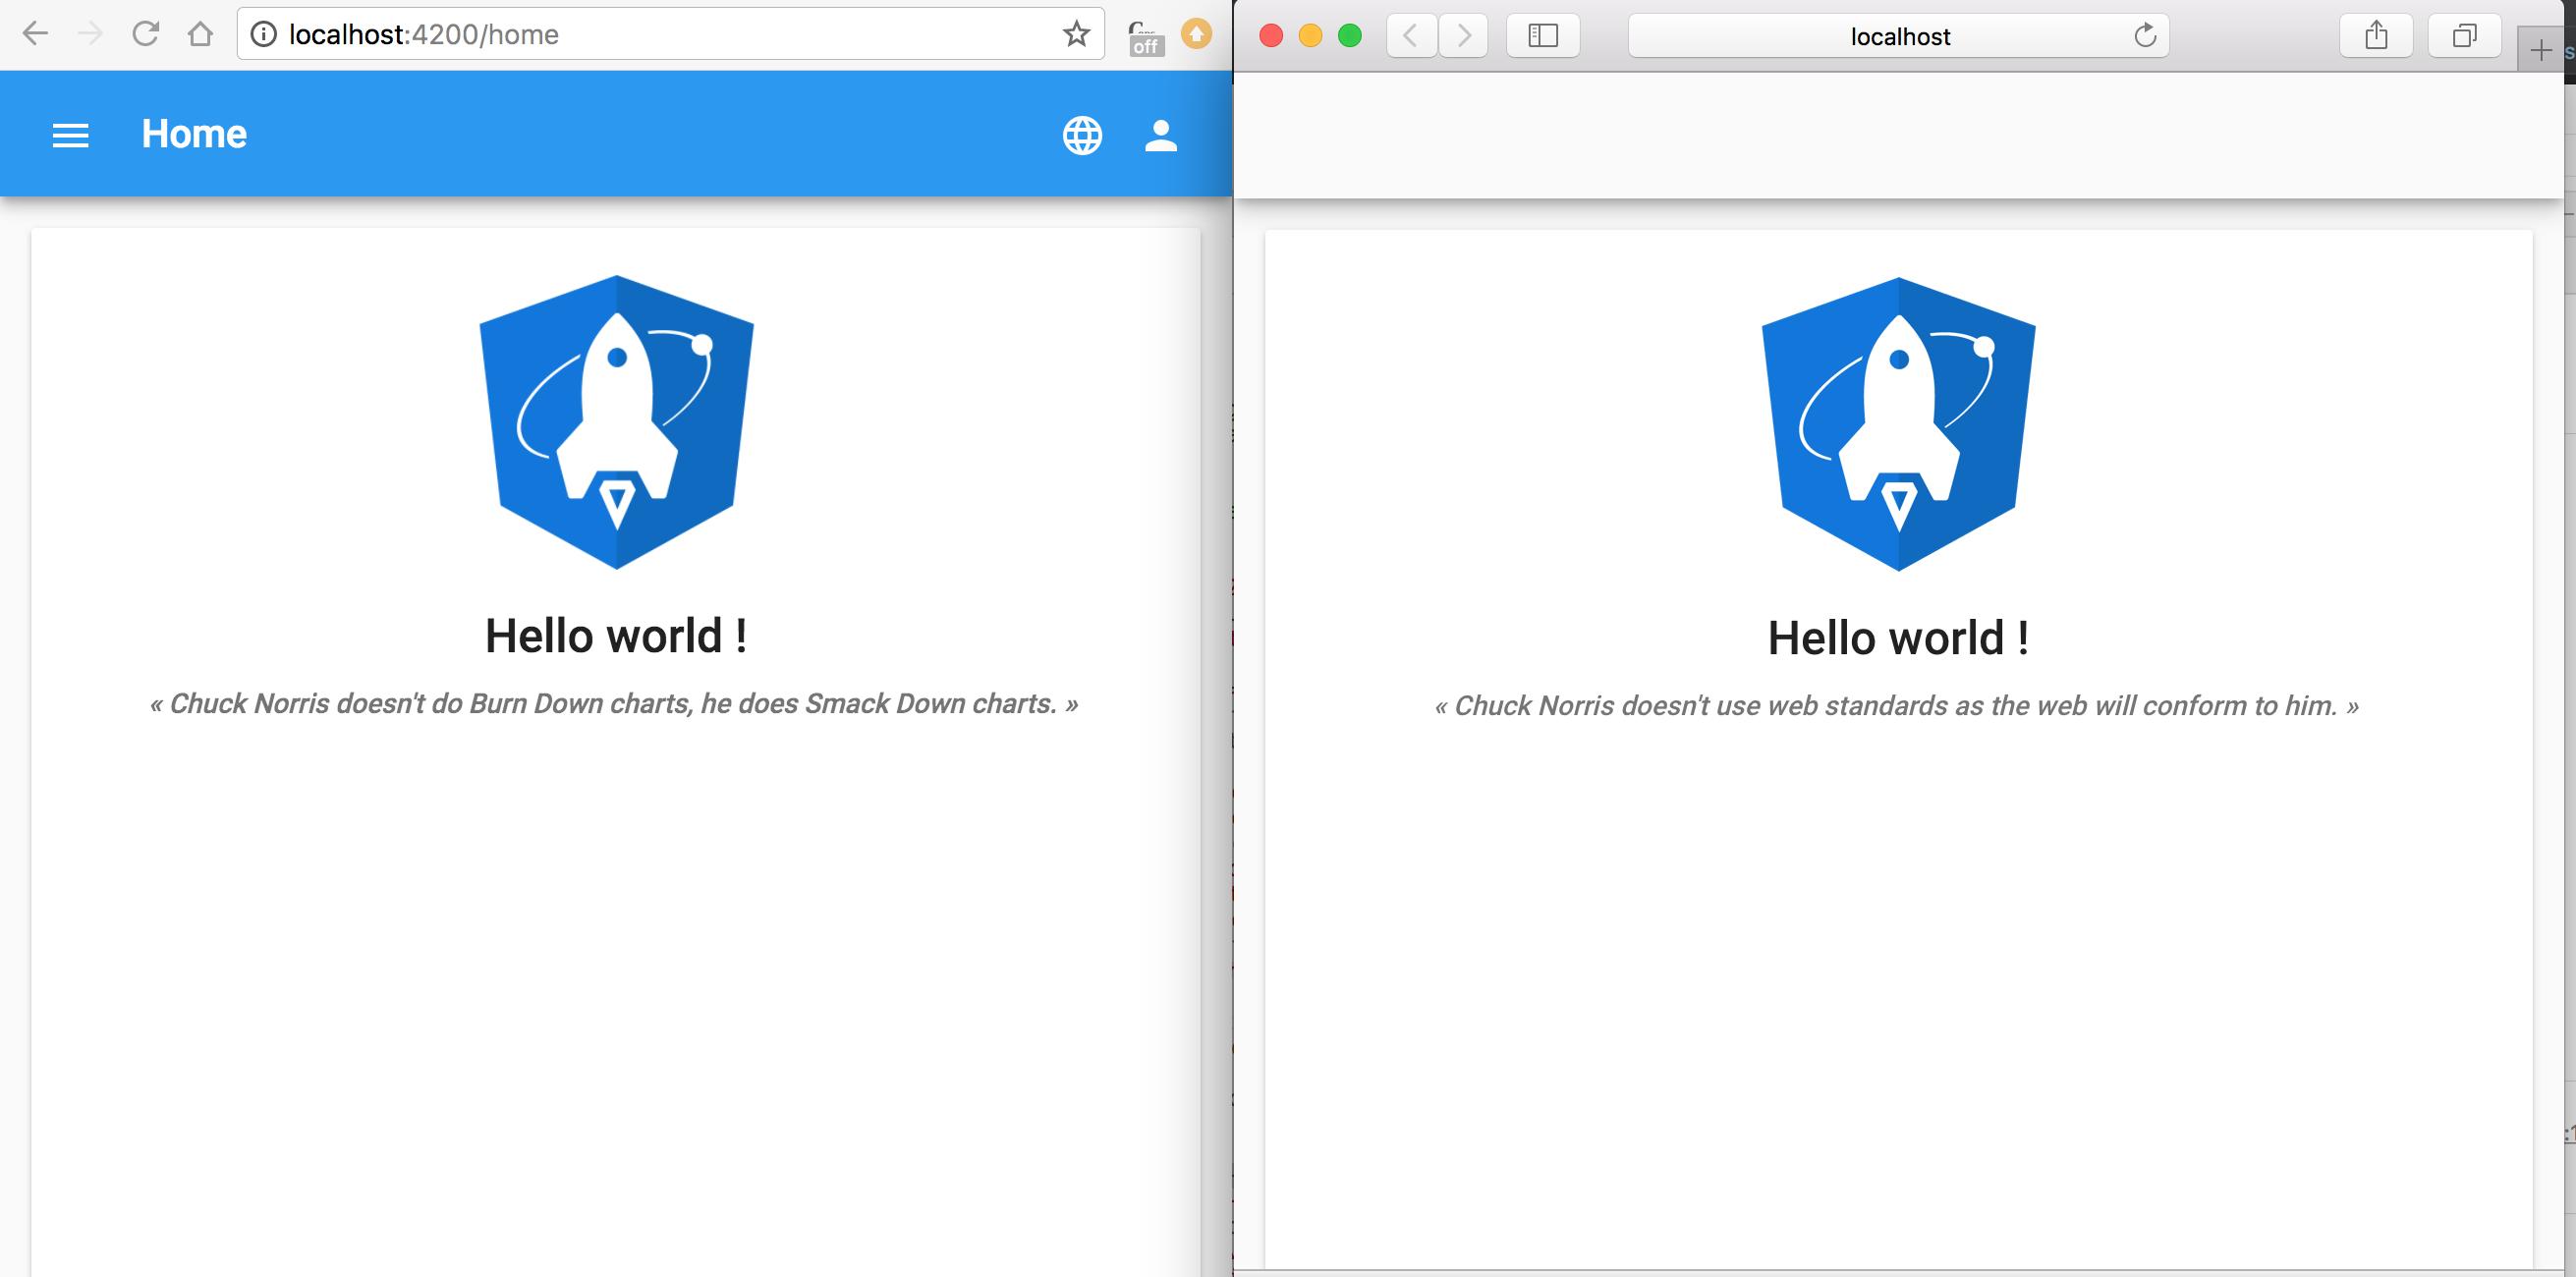 mat-toolbar does not display correctly on Safari, iOS simulator and